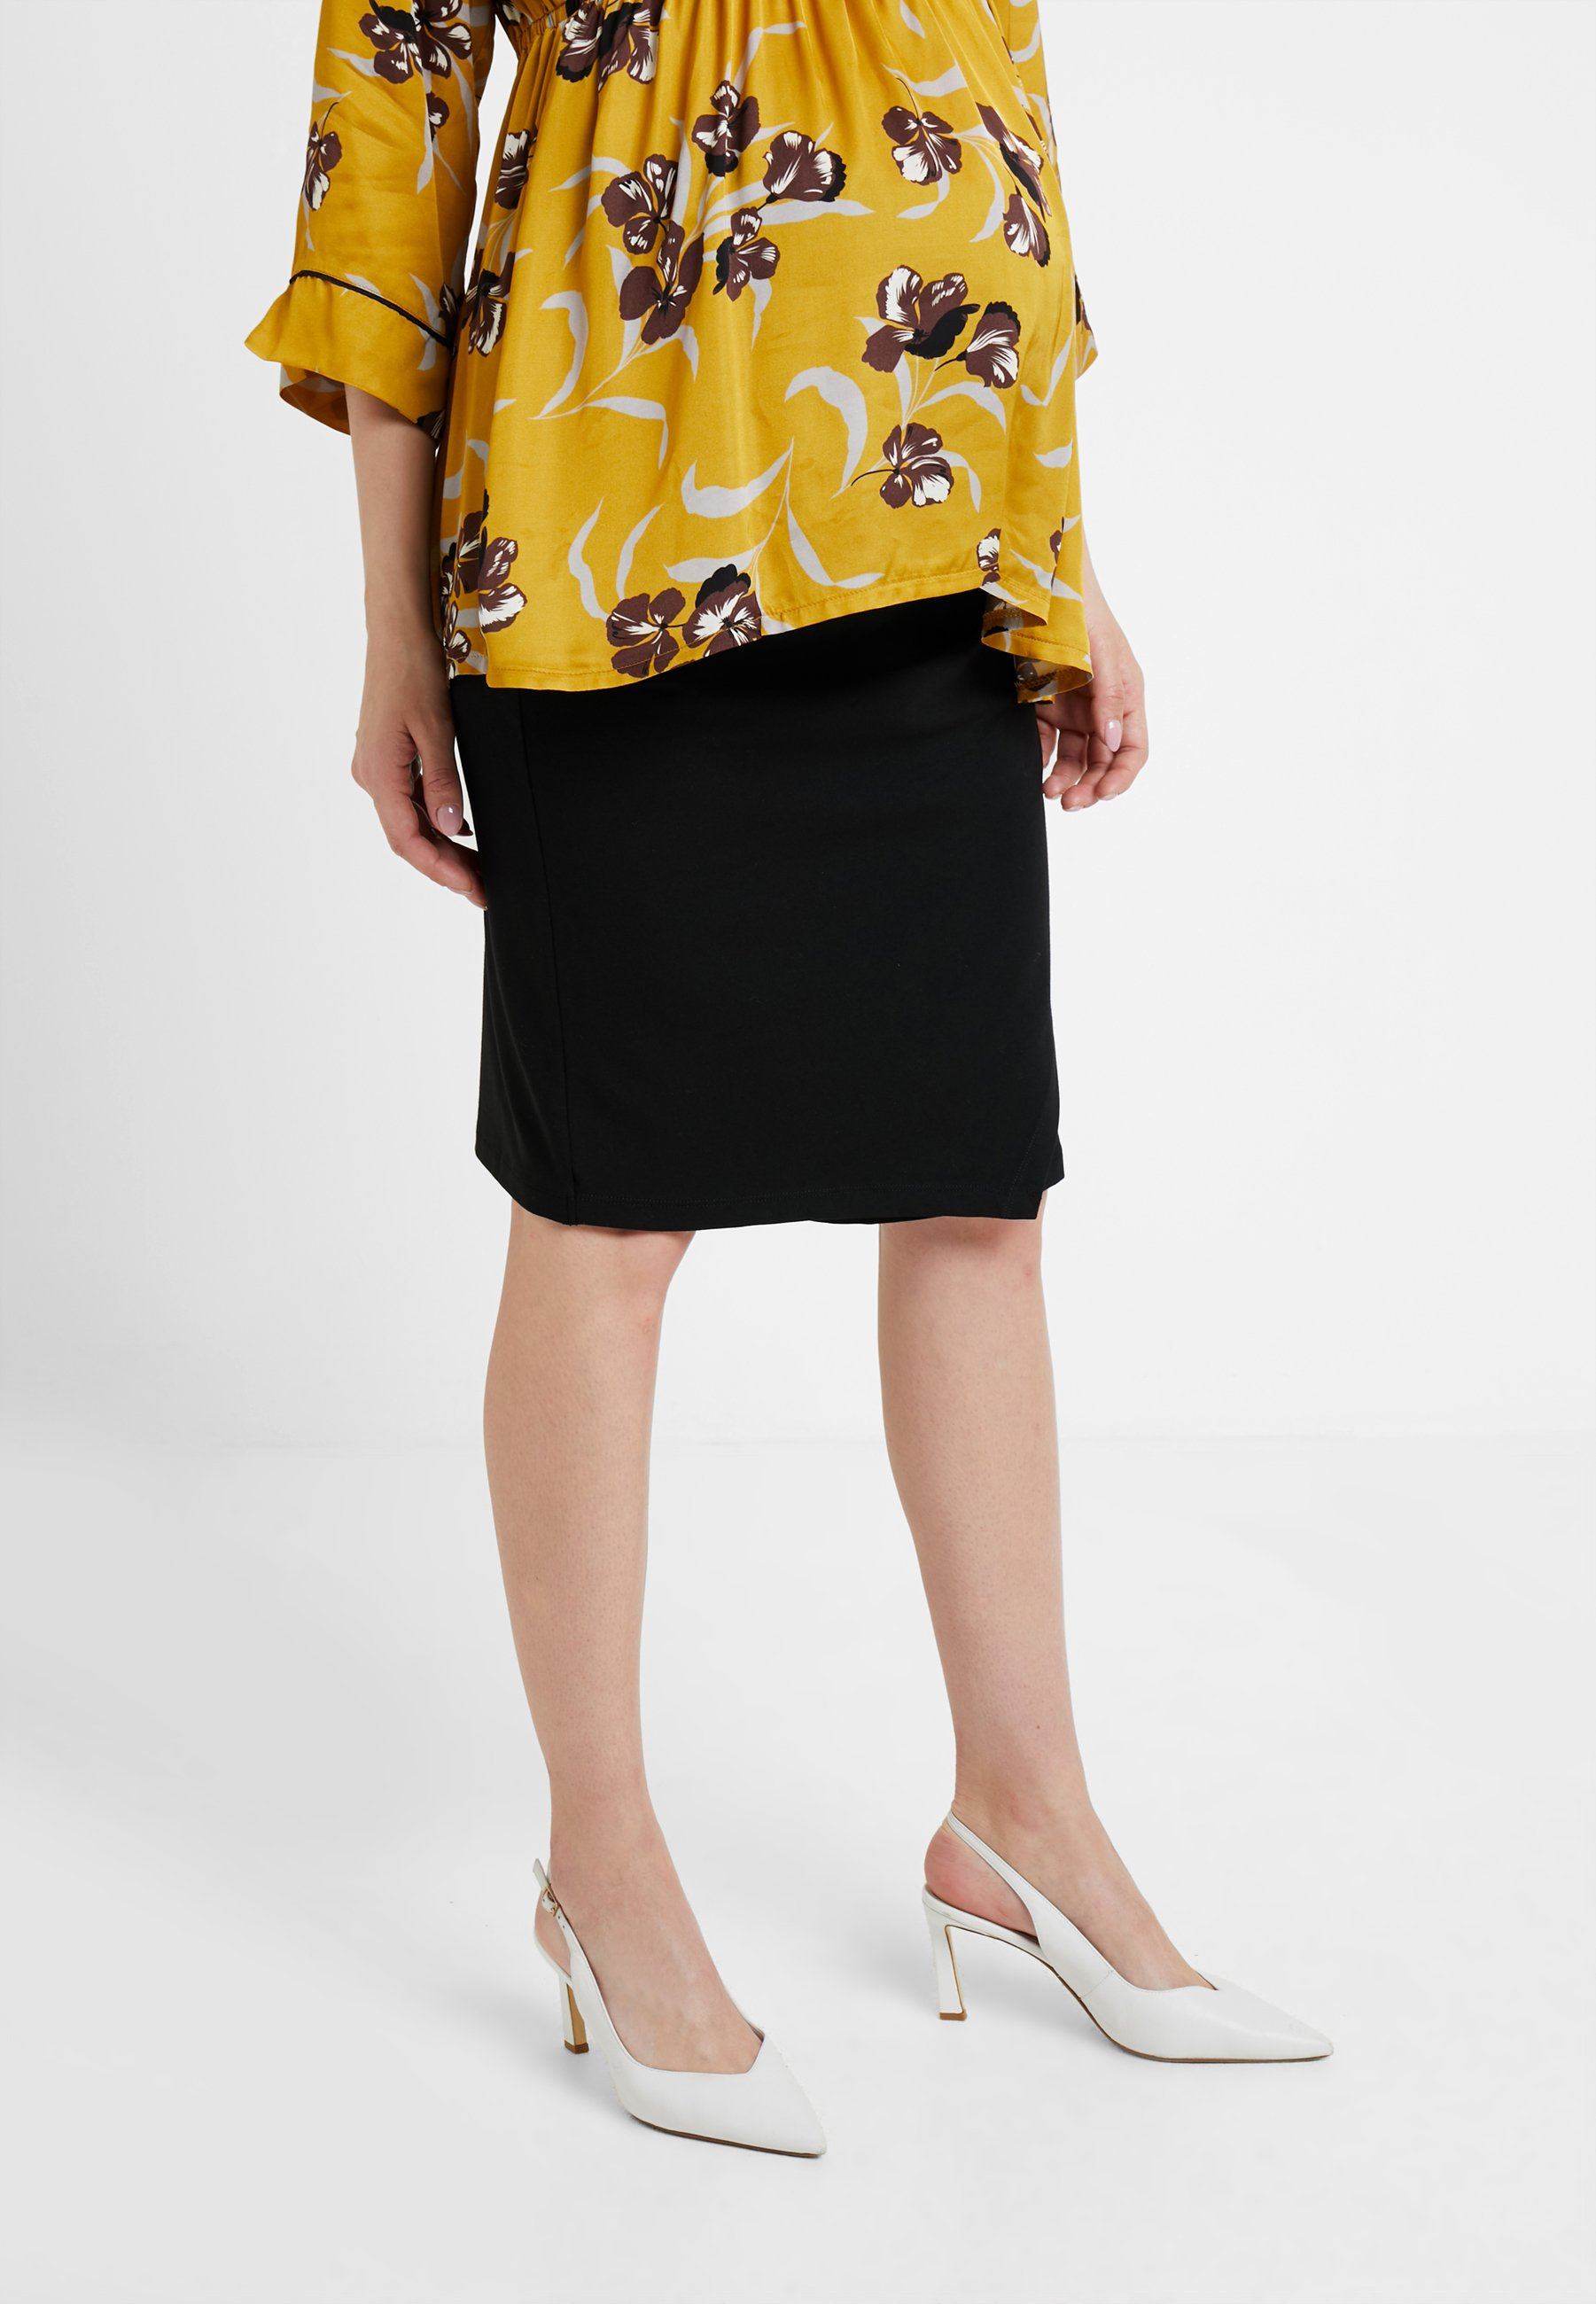 Black Mum KneeJupe Queen Skirt Crayon 8wknPO0